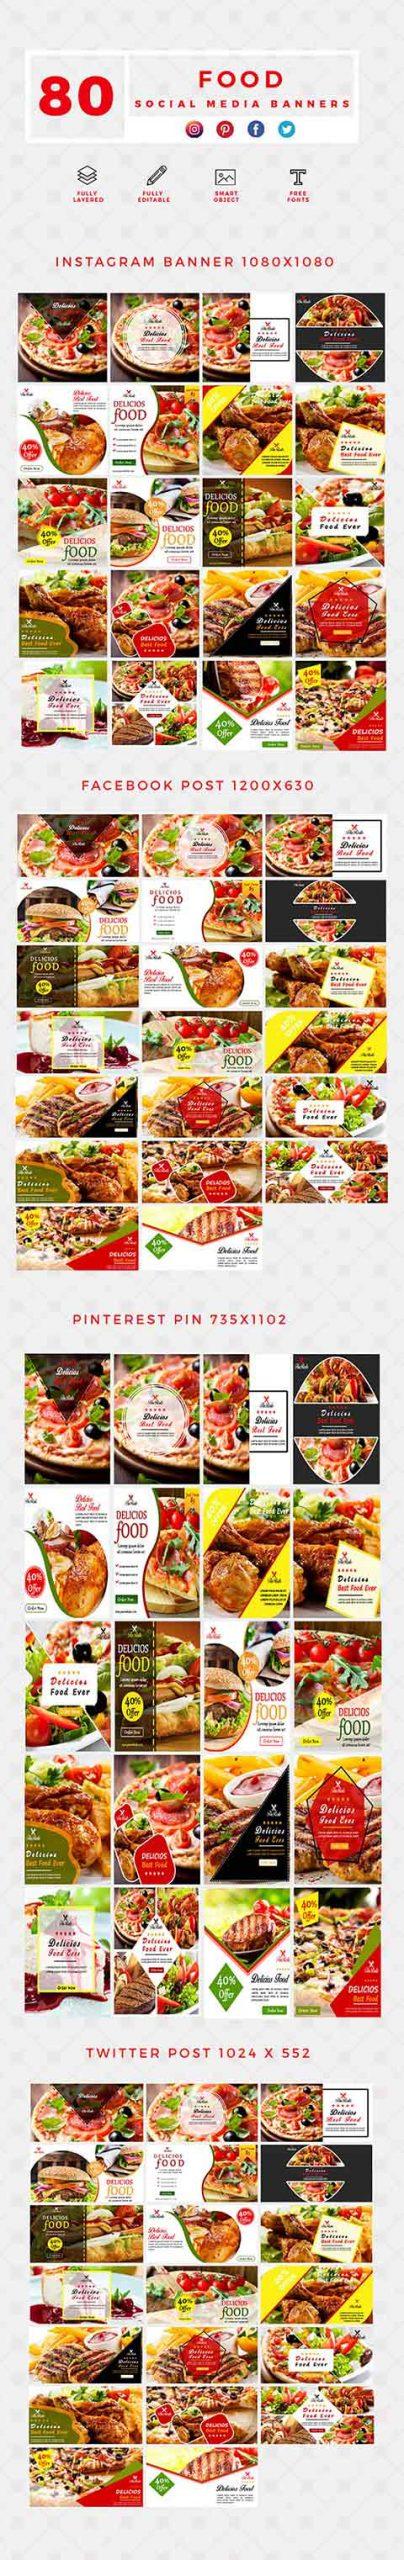 640 Social Media Banner Templates Bundle PREVIEW-FOOD